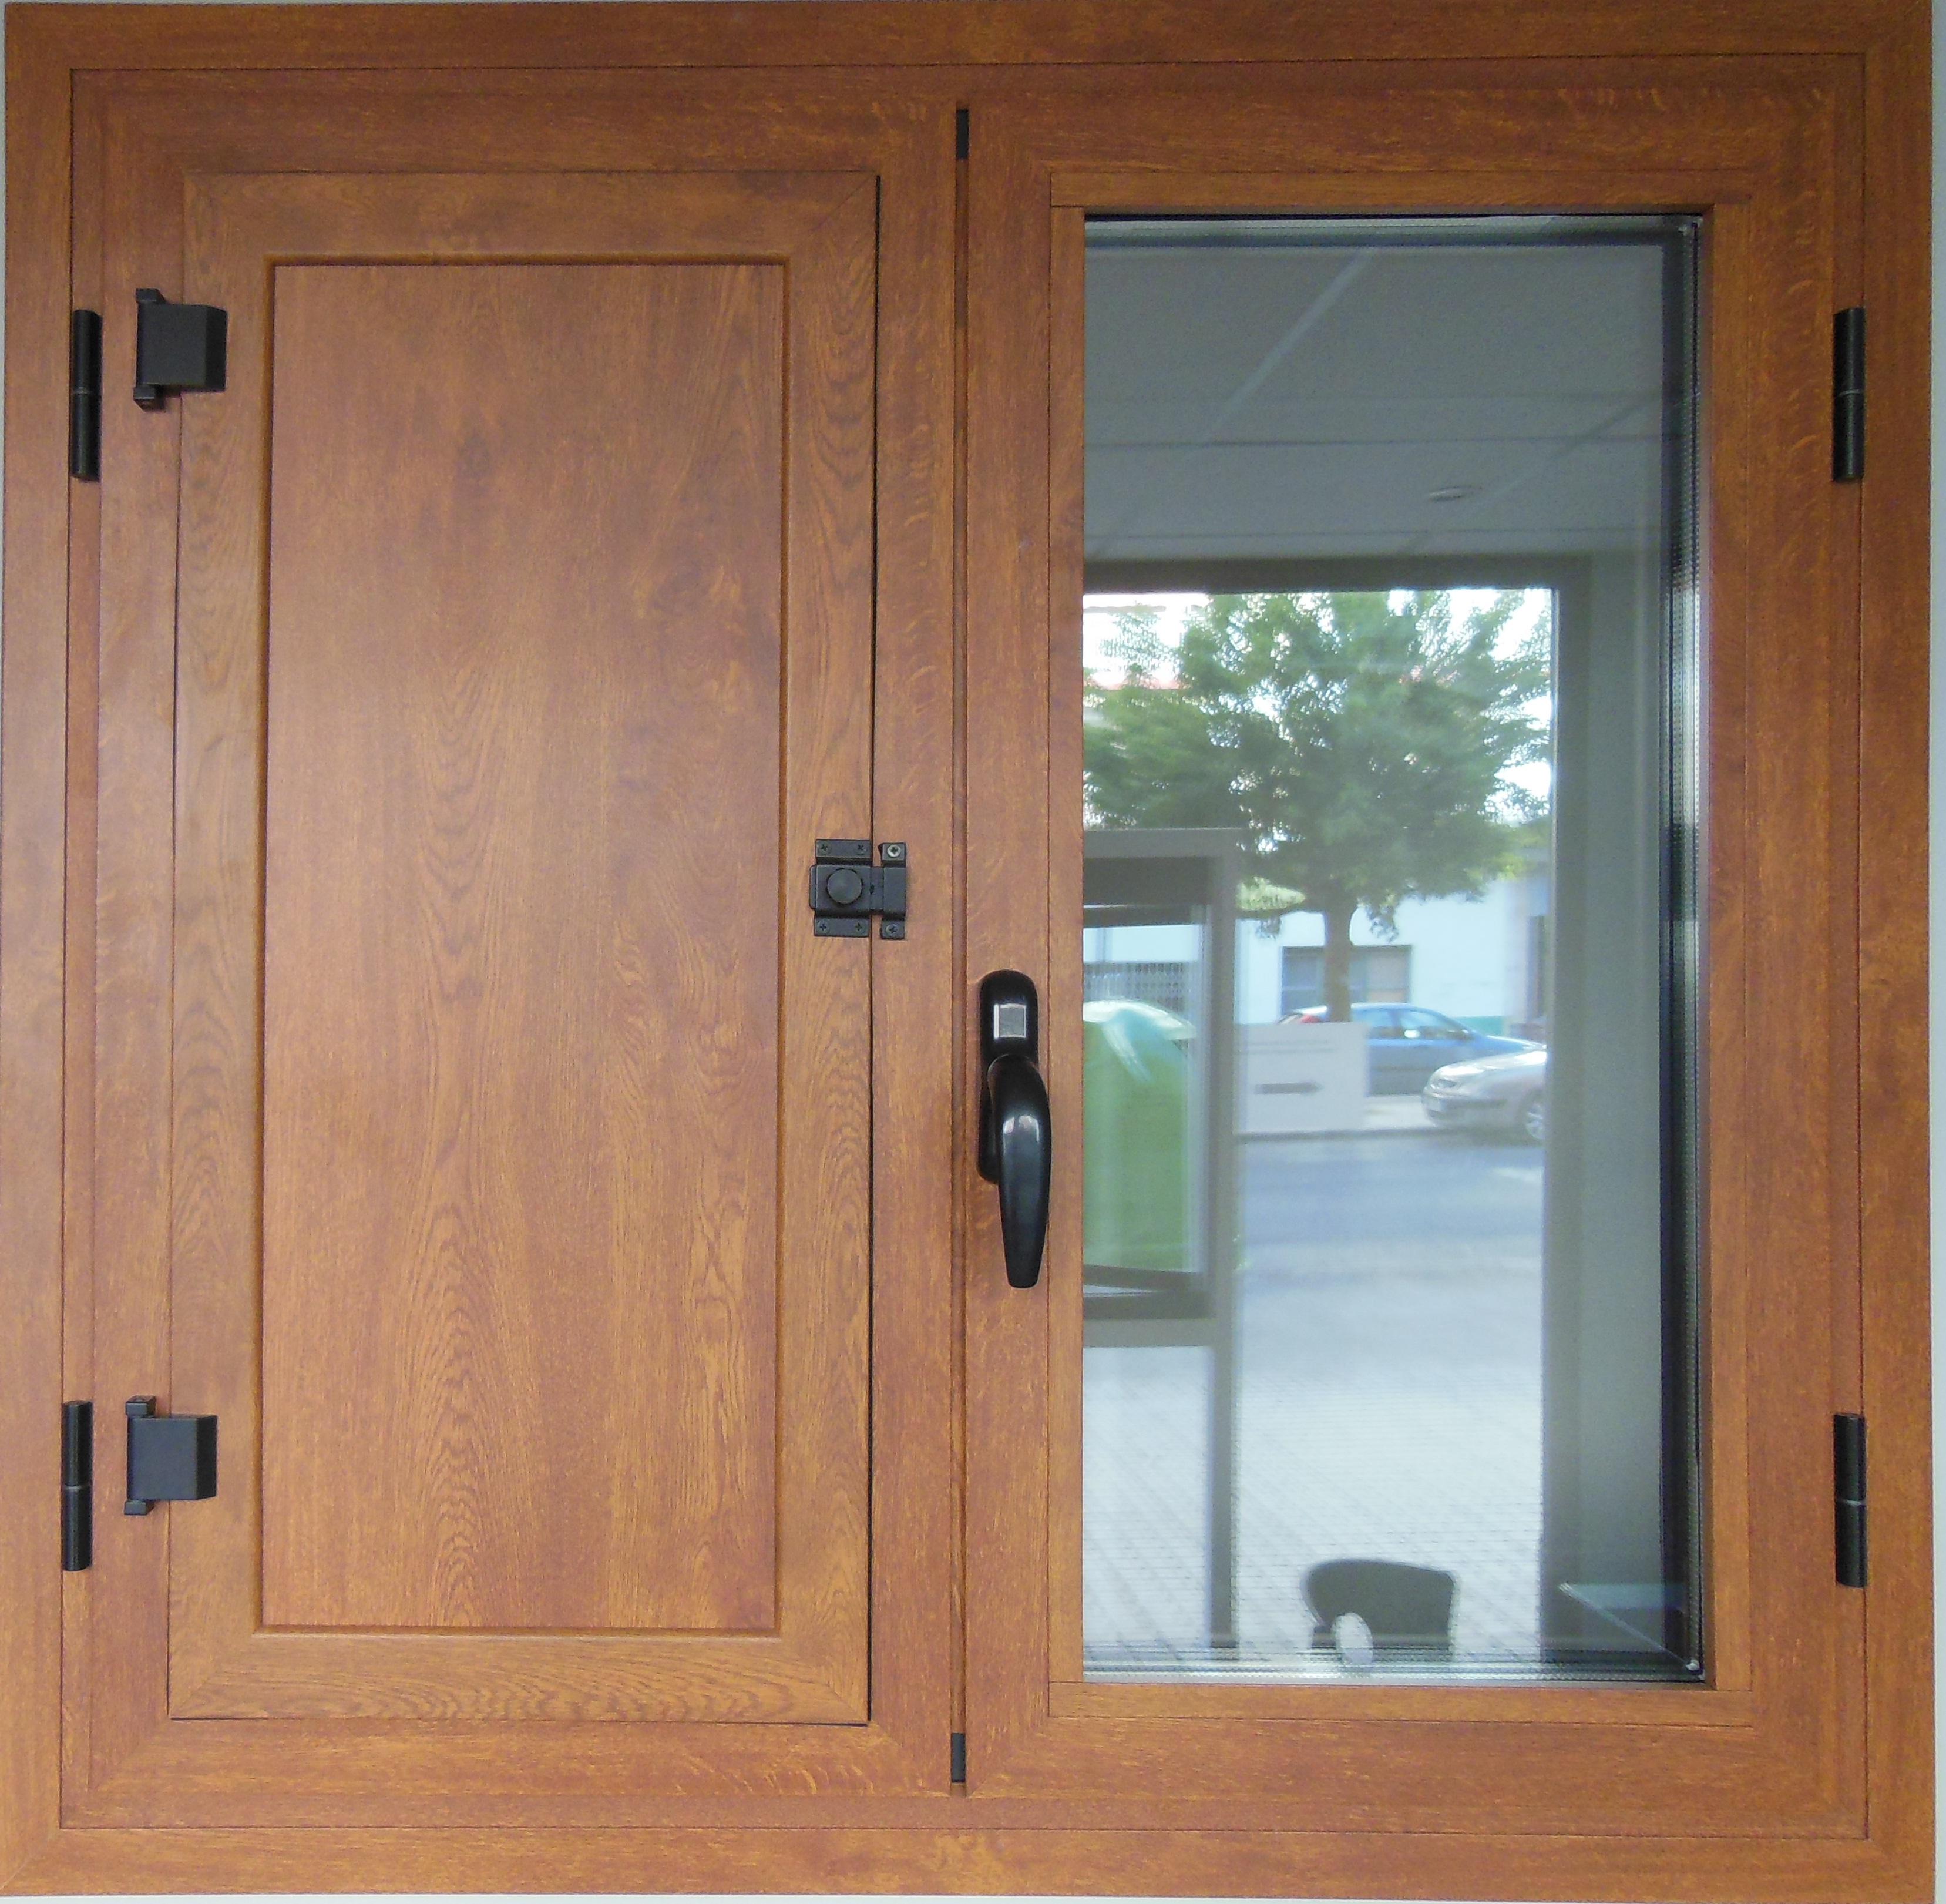 Casa de este alojamiento montaje ventanas de aluminio - Bentanas de aluminio ...